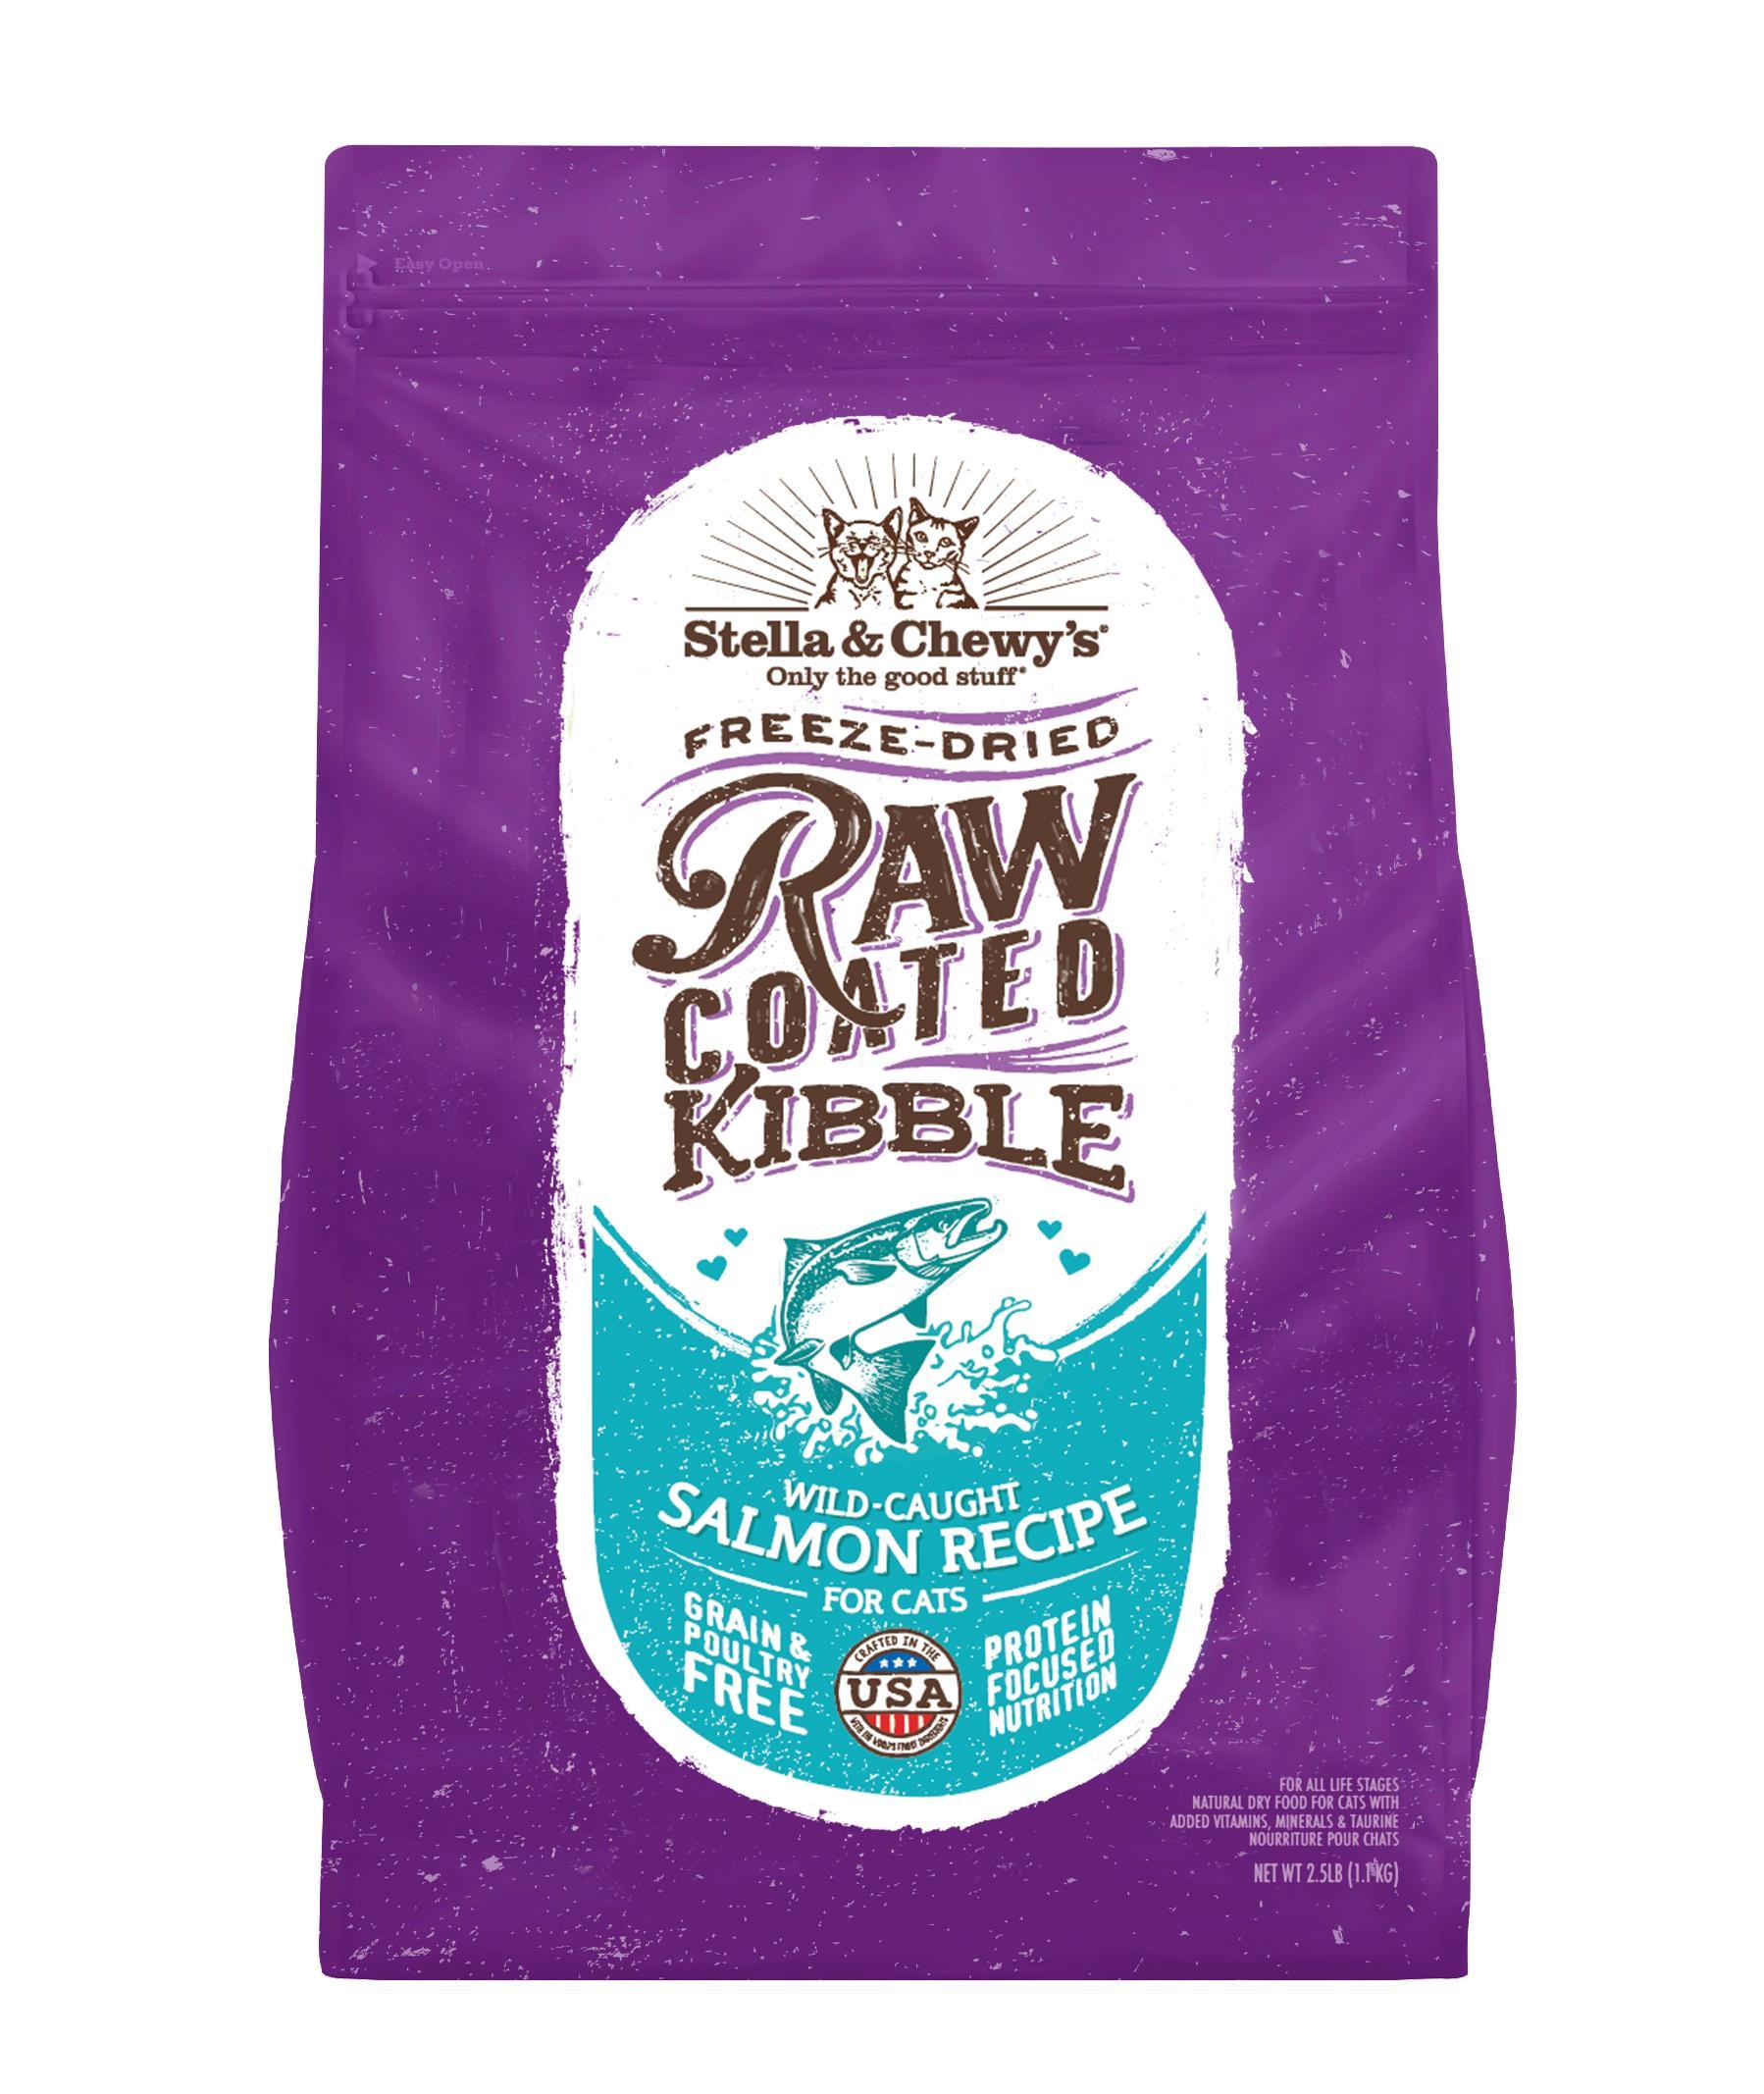 Stella & Chewy's Raw Coated Kibble Wild Caught Salmon Recipe Grain-Free Dry Cat Food, 2.5-lb